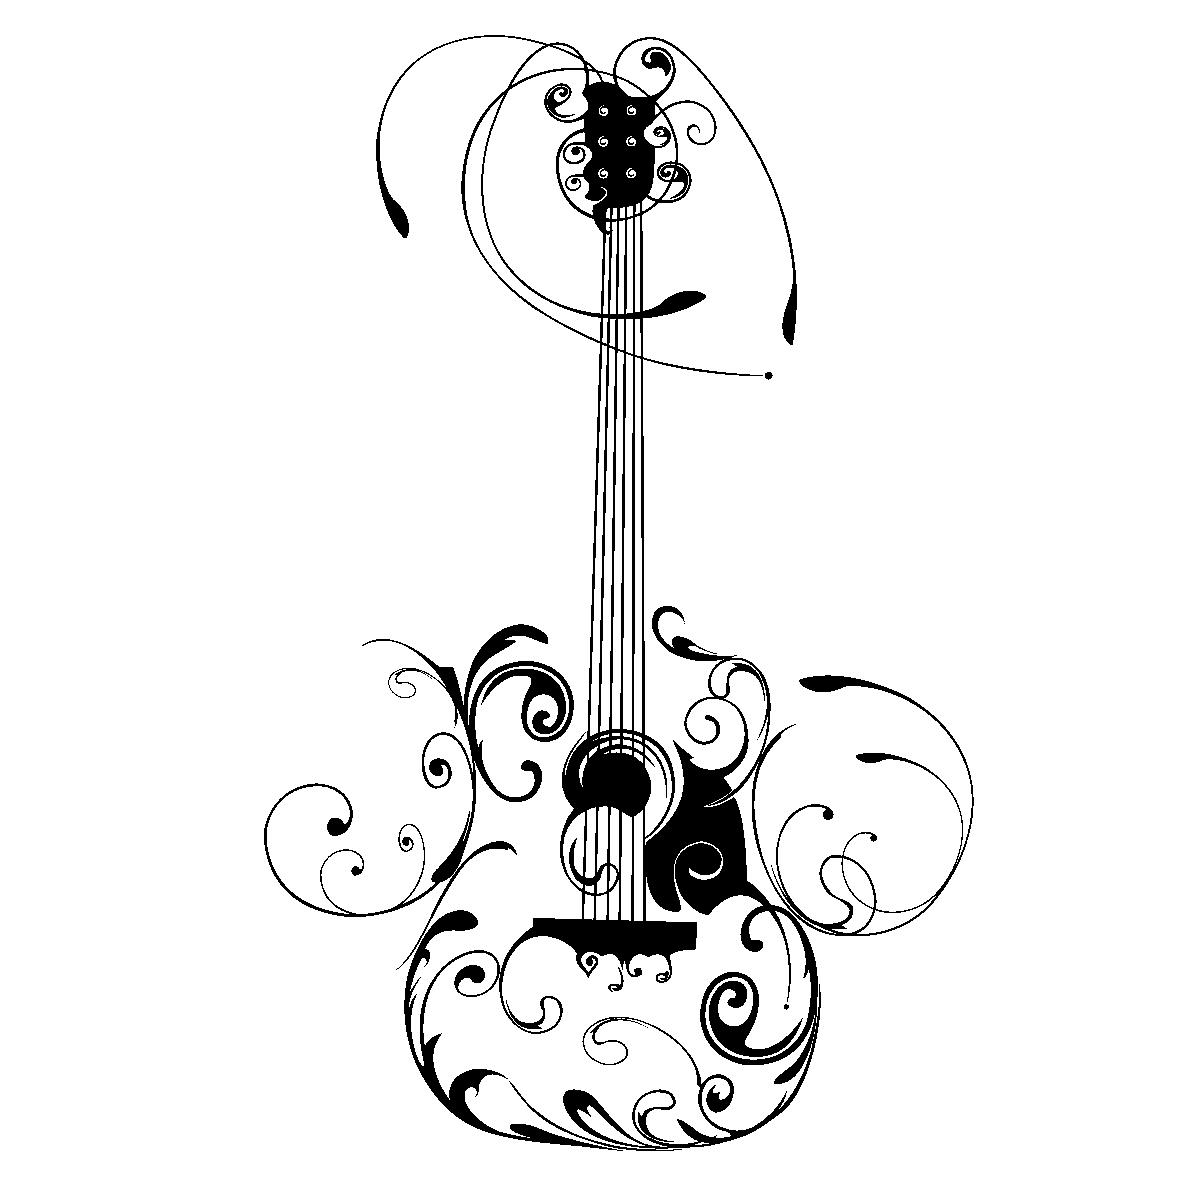 electric guitar drawing png